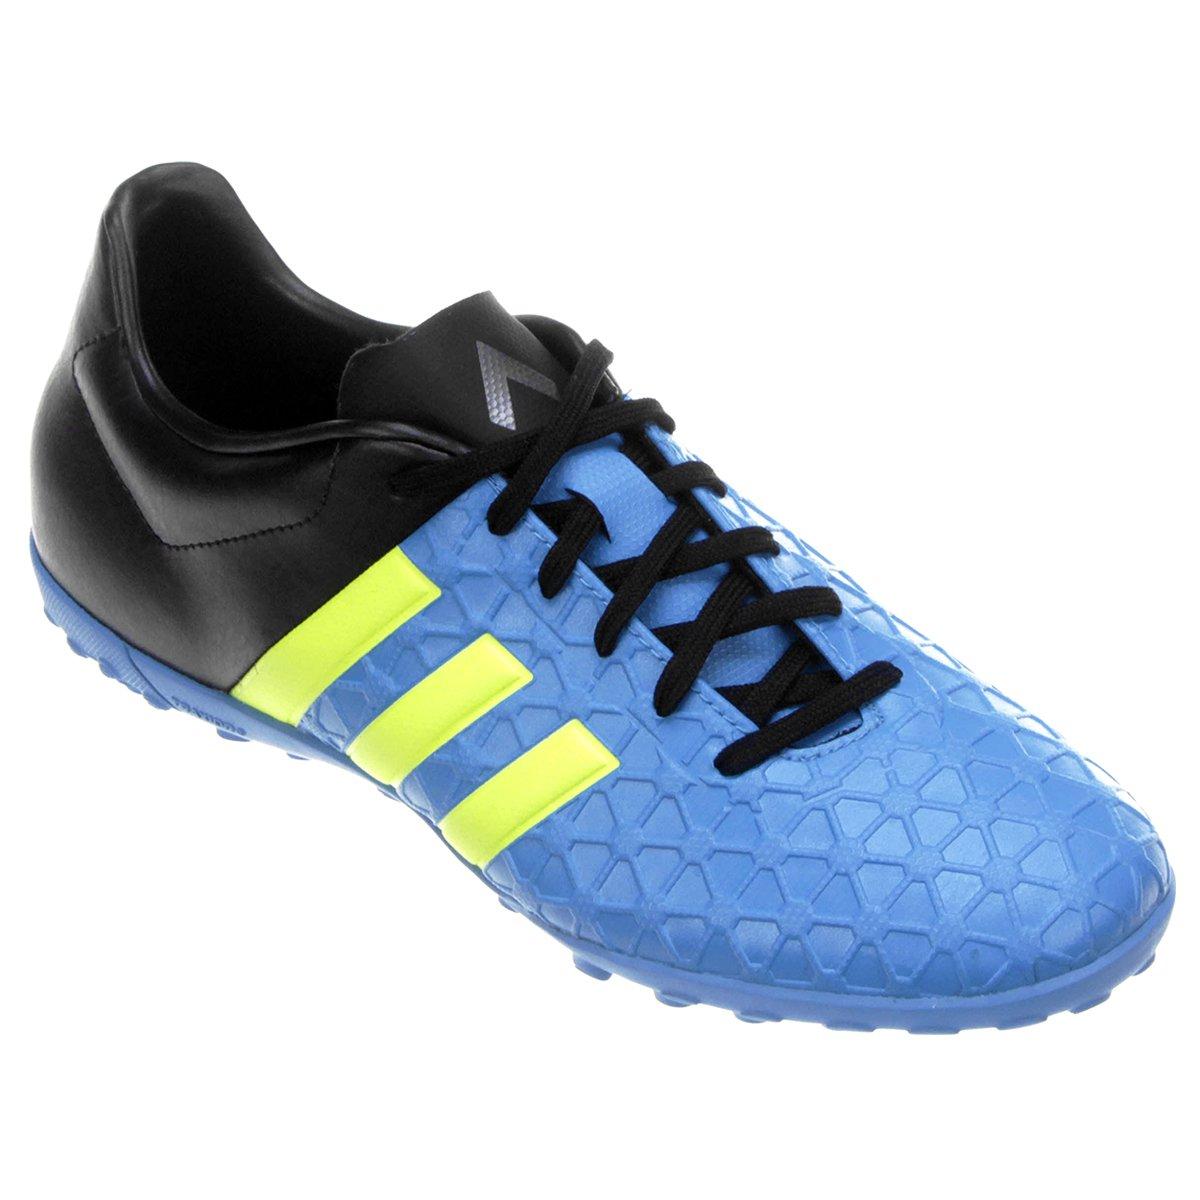 Chuteira Society Adidas Ace 15 4 TF Masculina - Compre Agora  1739fc5a83225